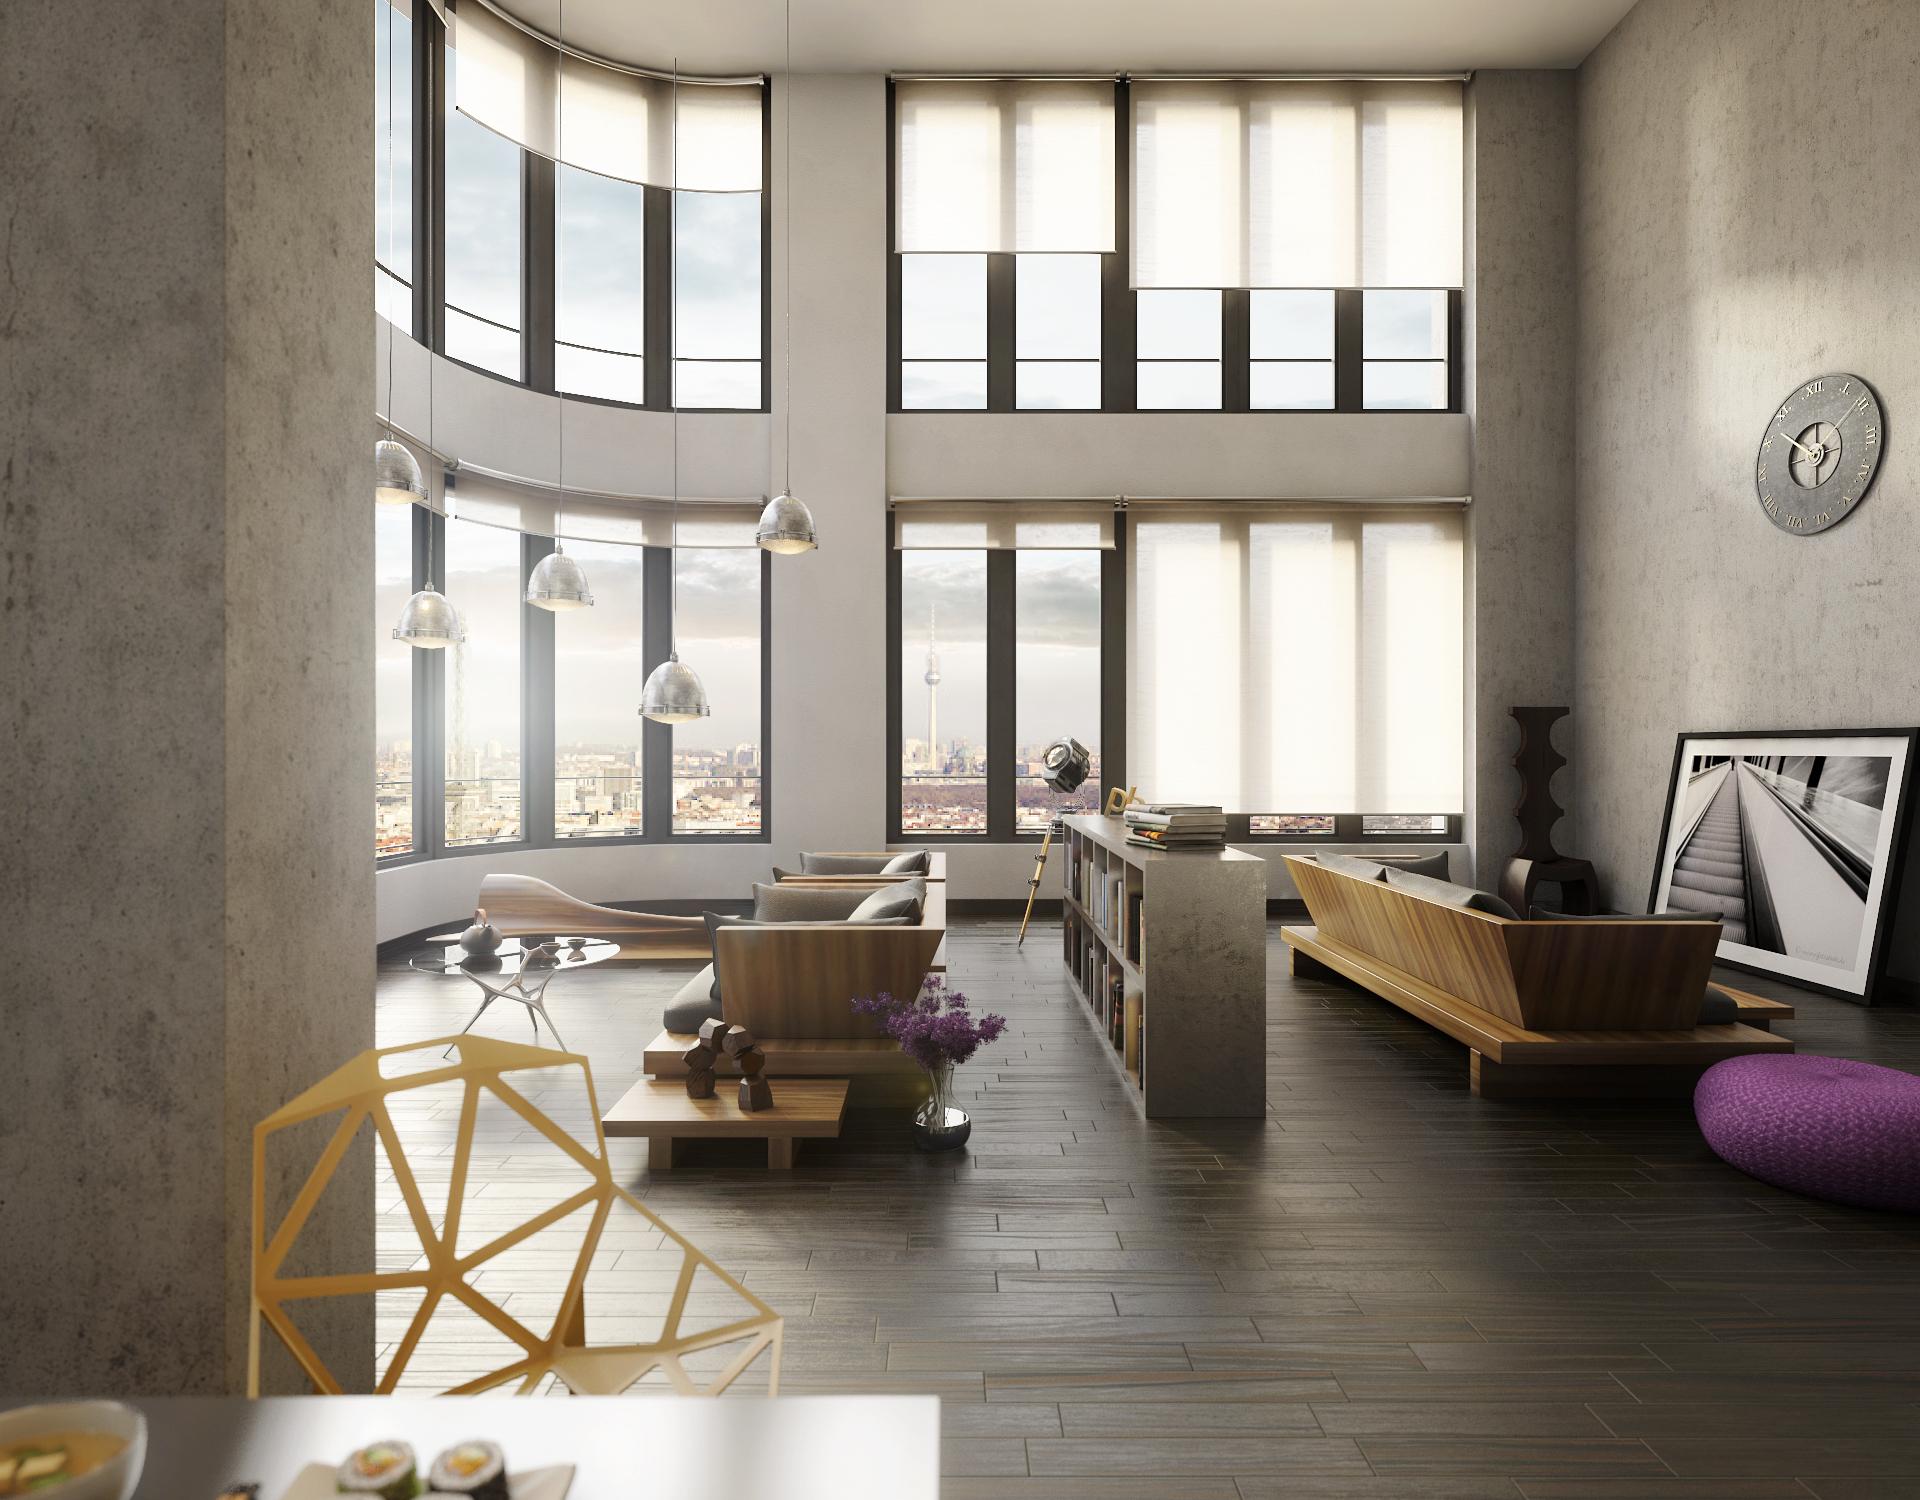 architekturrenderings als high end visualisierung. Black Bedroom Furniture Sets. Home Design Ideas